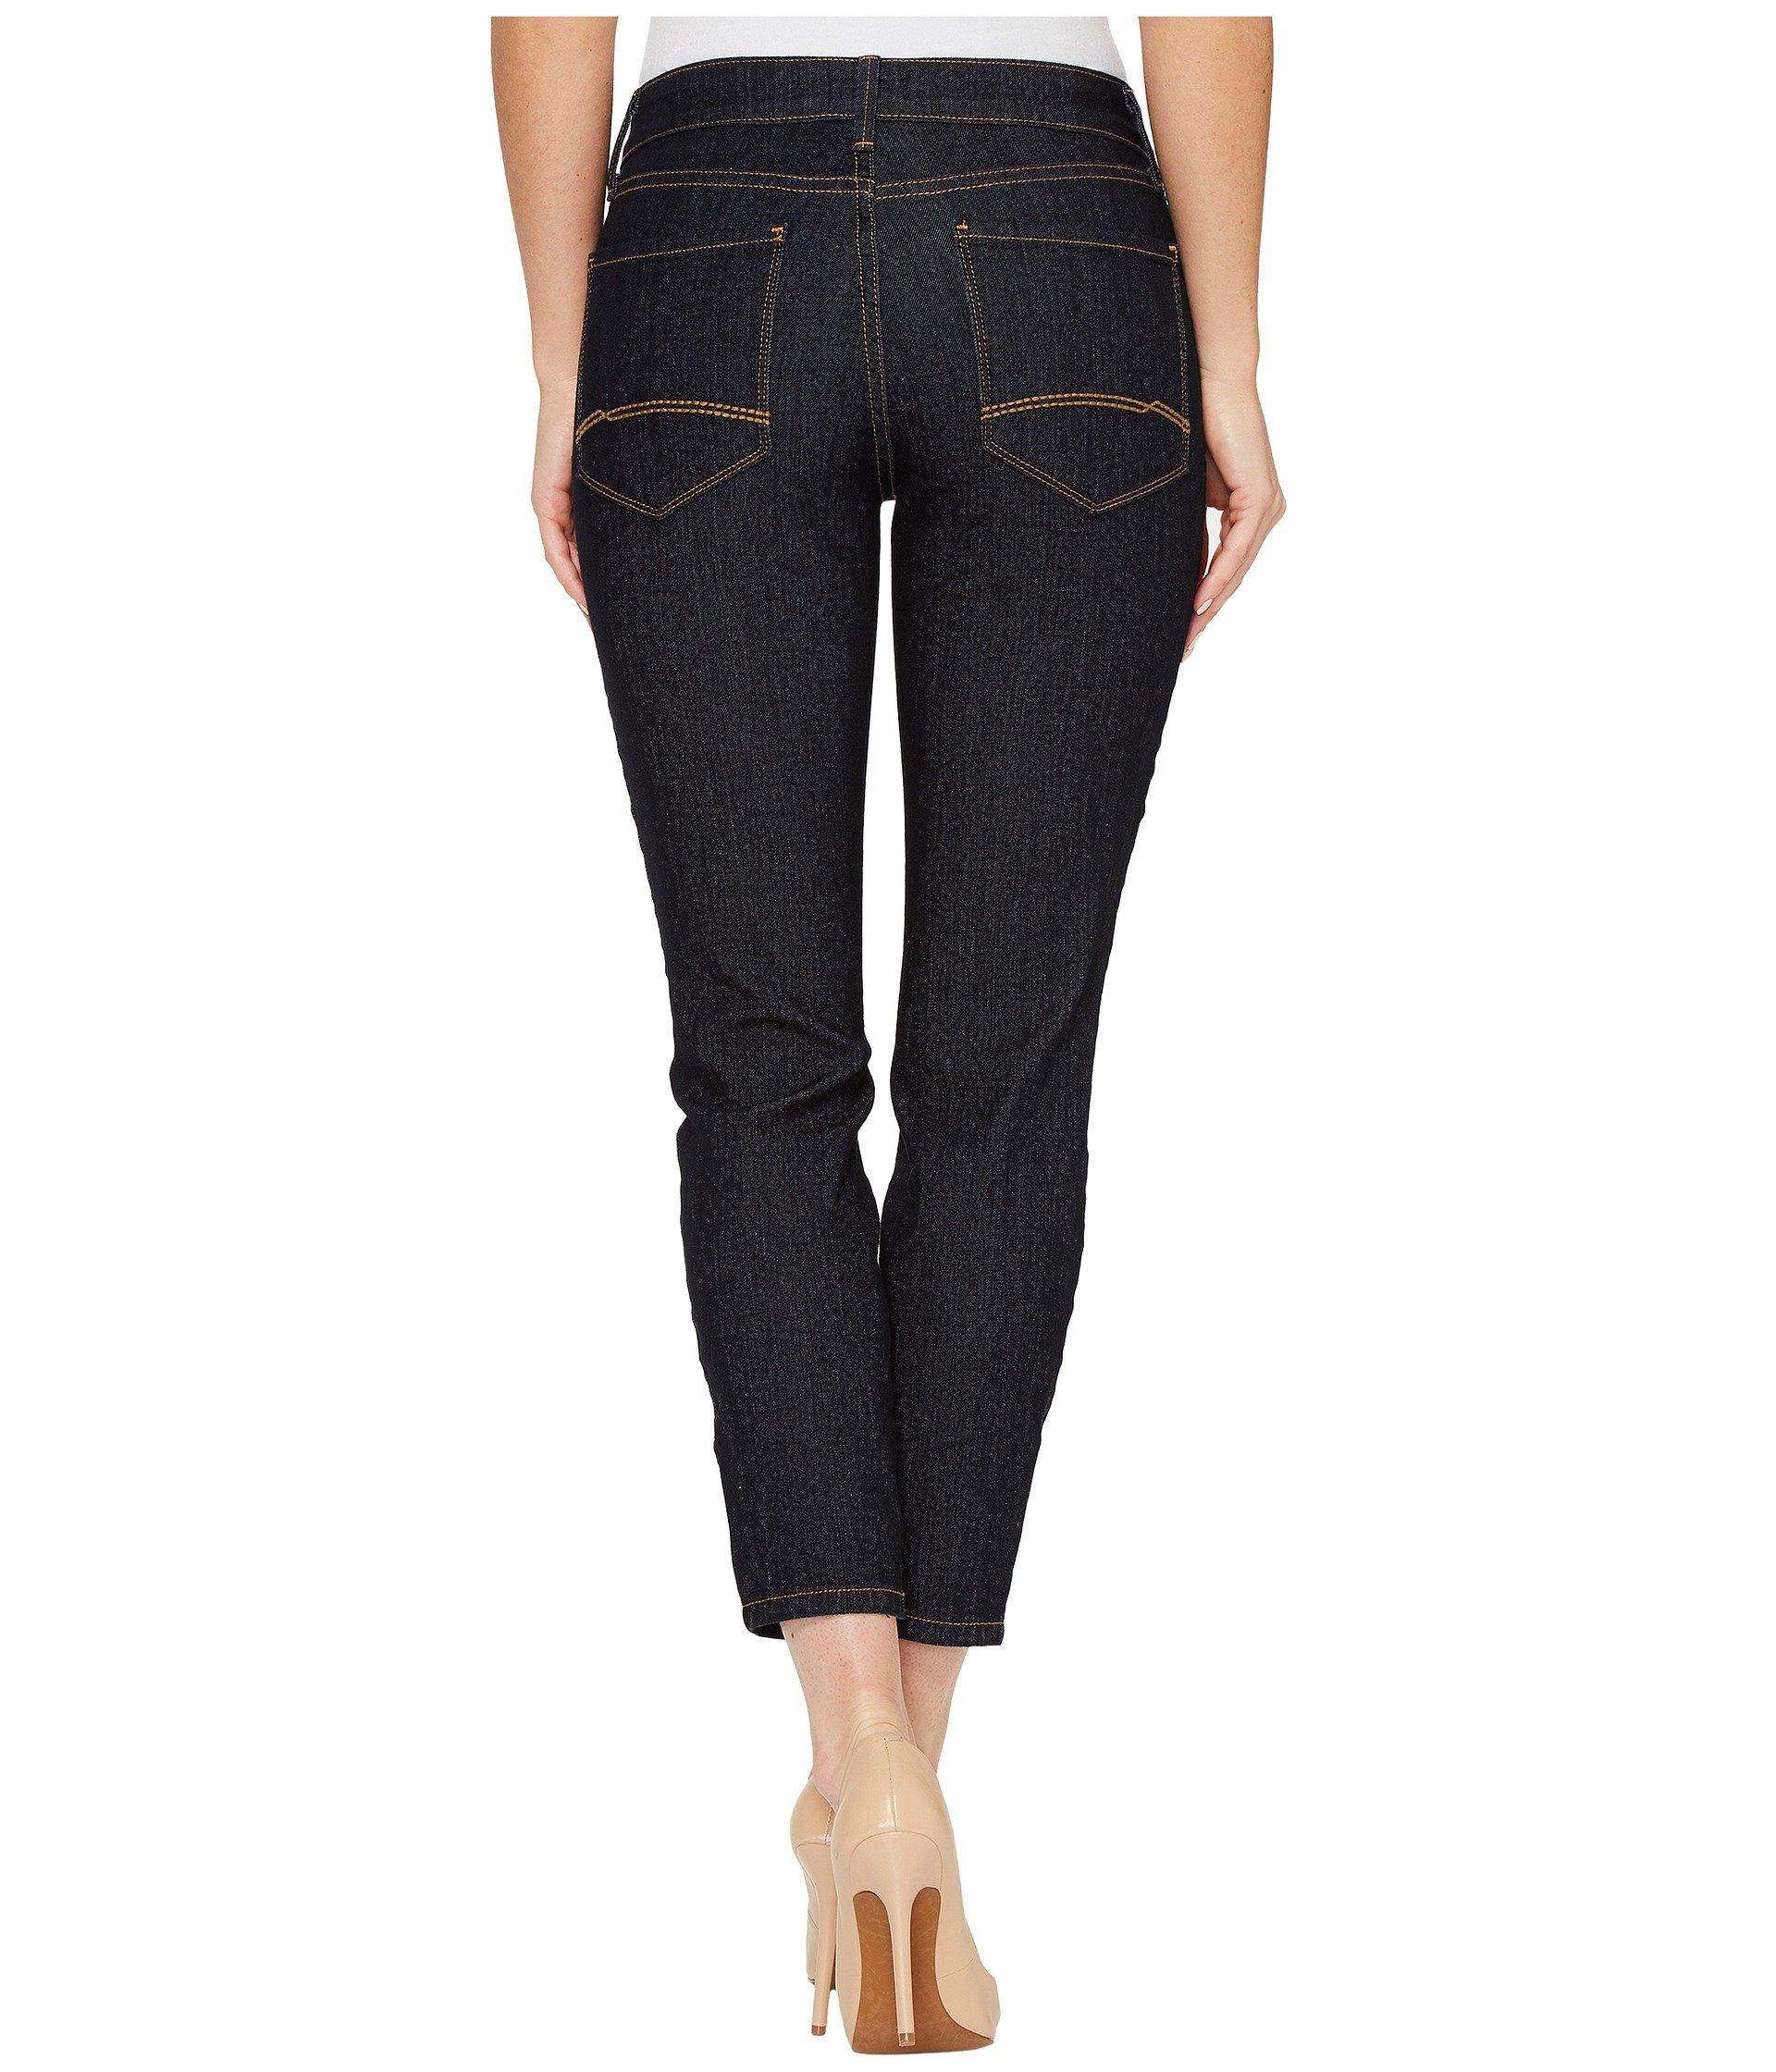 Nydj petite skinny jeans